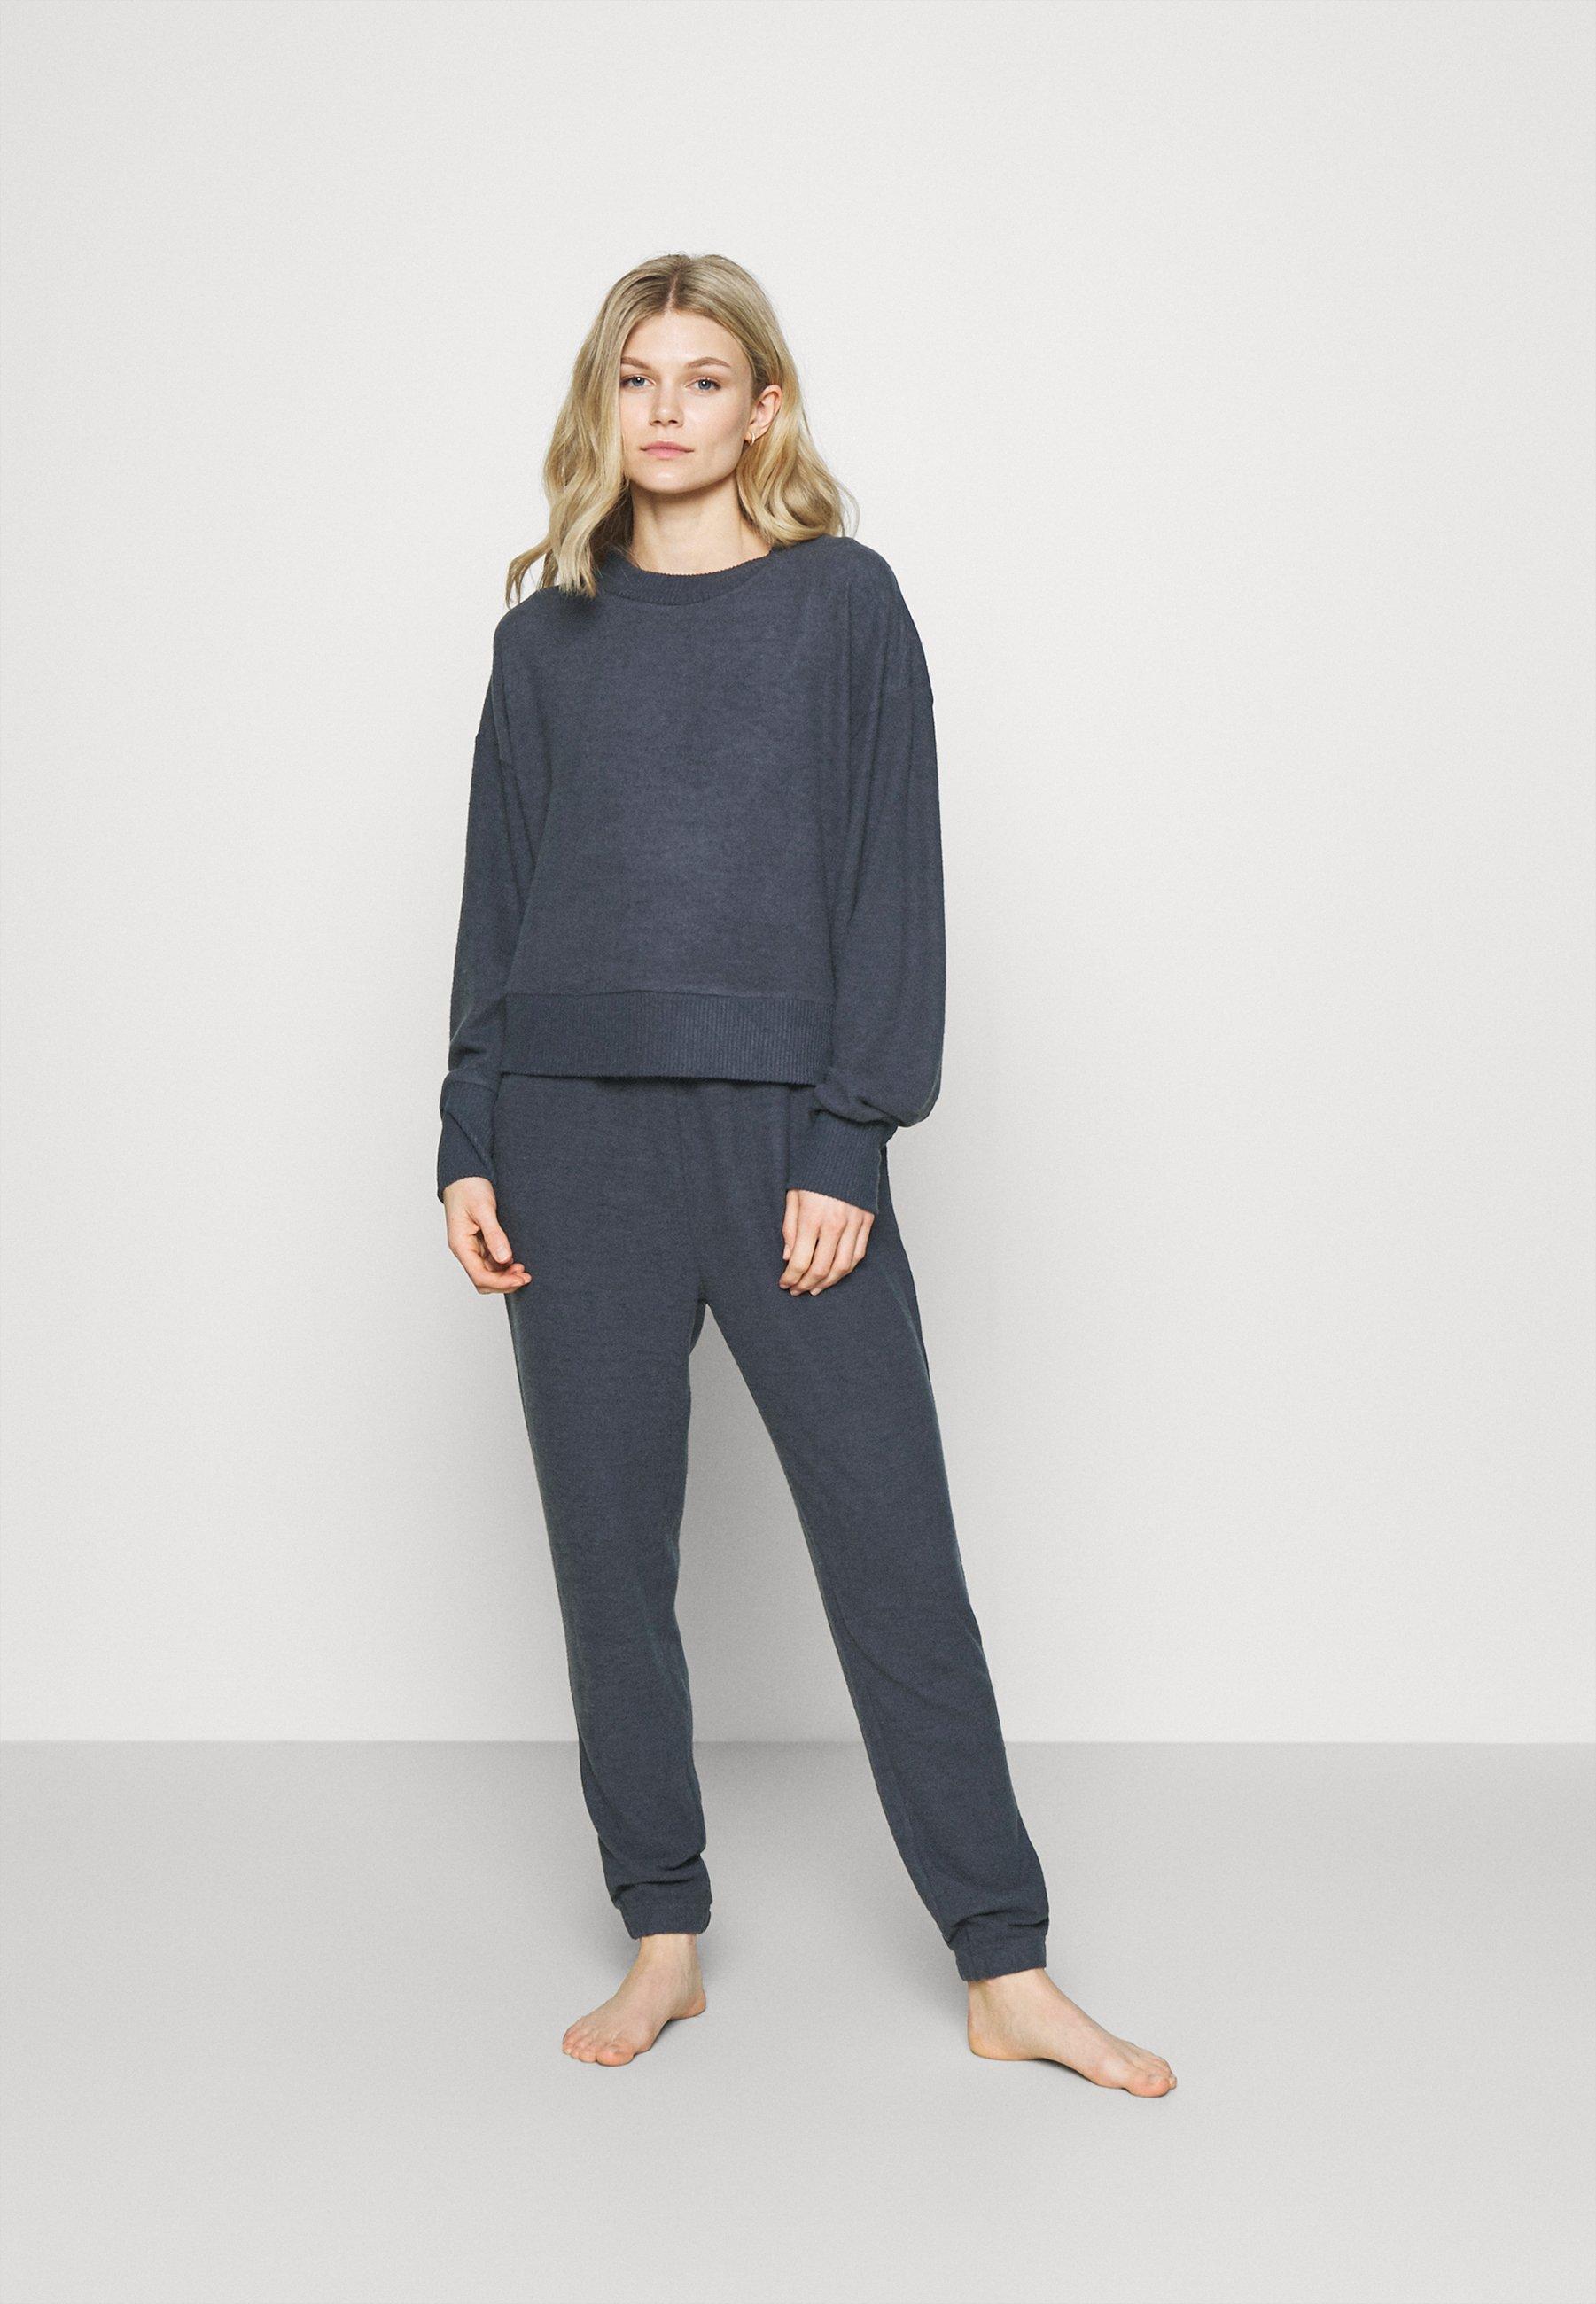 Femme SUPER SOFT CREW AND CUFF PANT - Pyjama